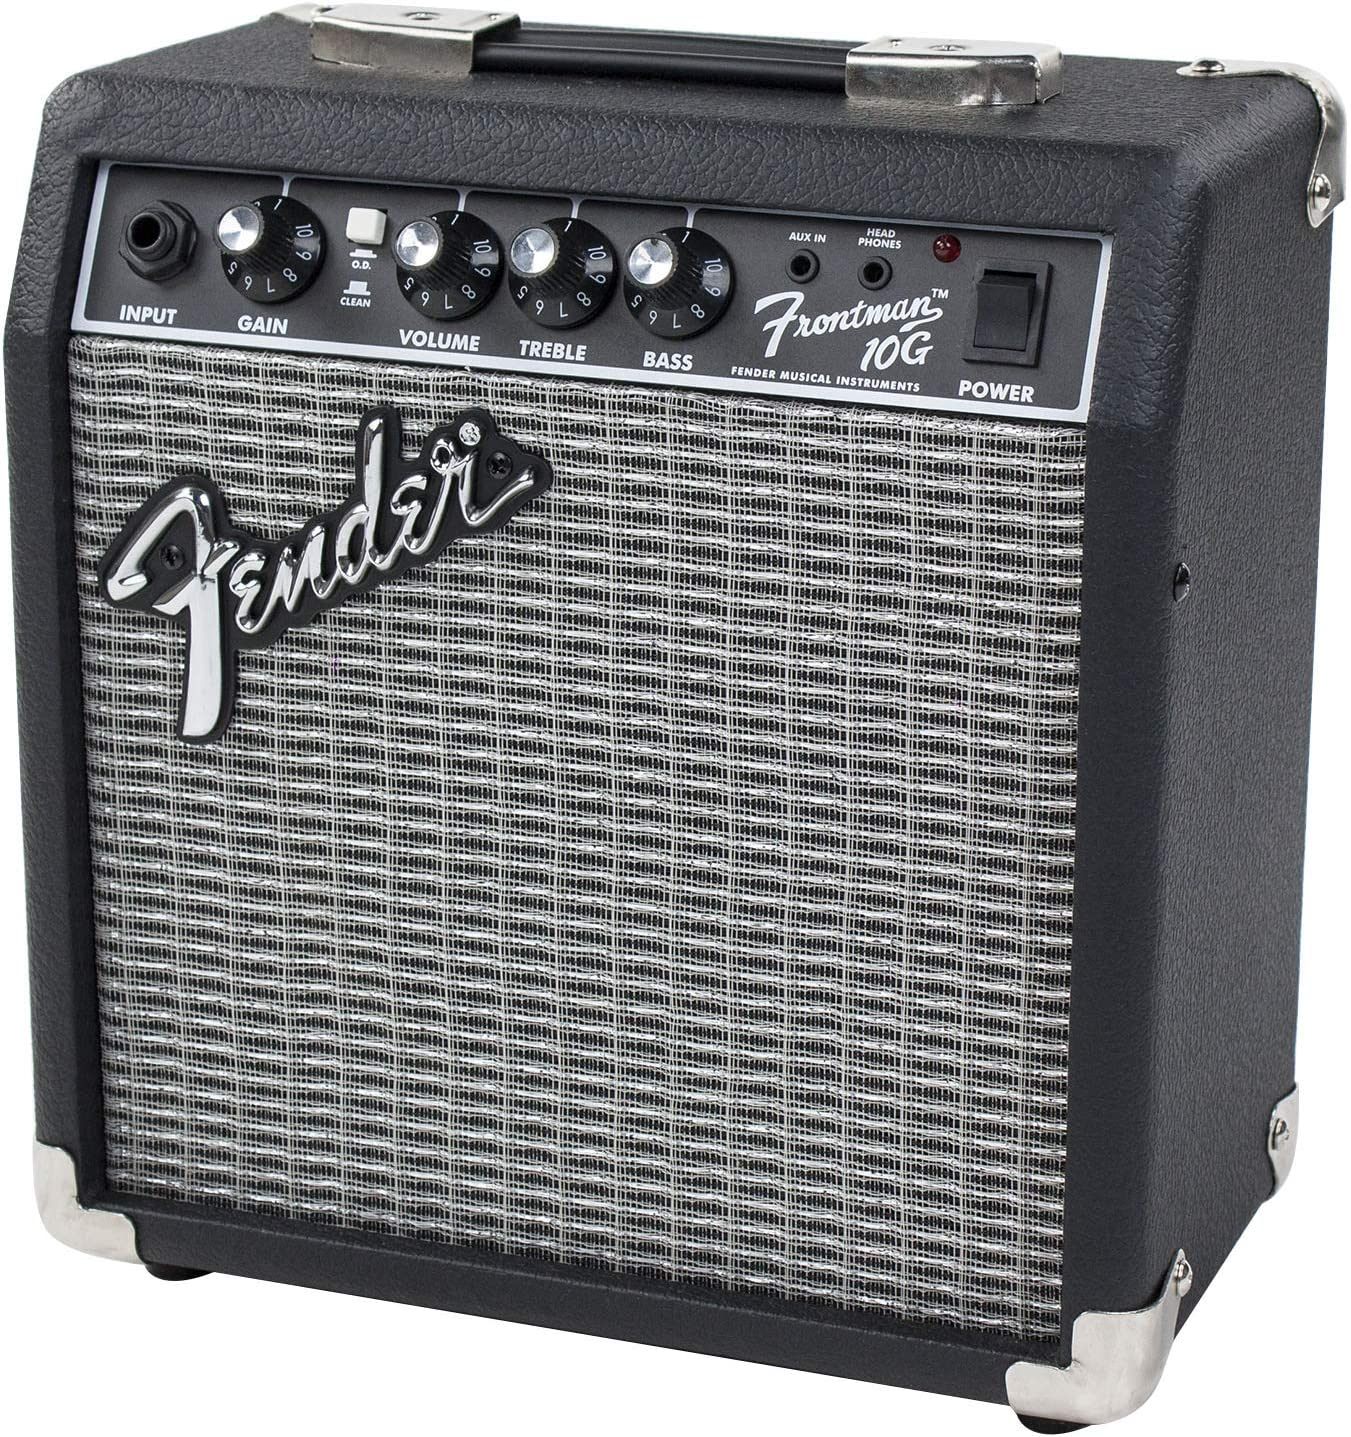 Fender Frontman - 10G Amplificador para guitarra, 230V EUR